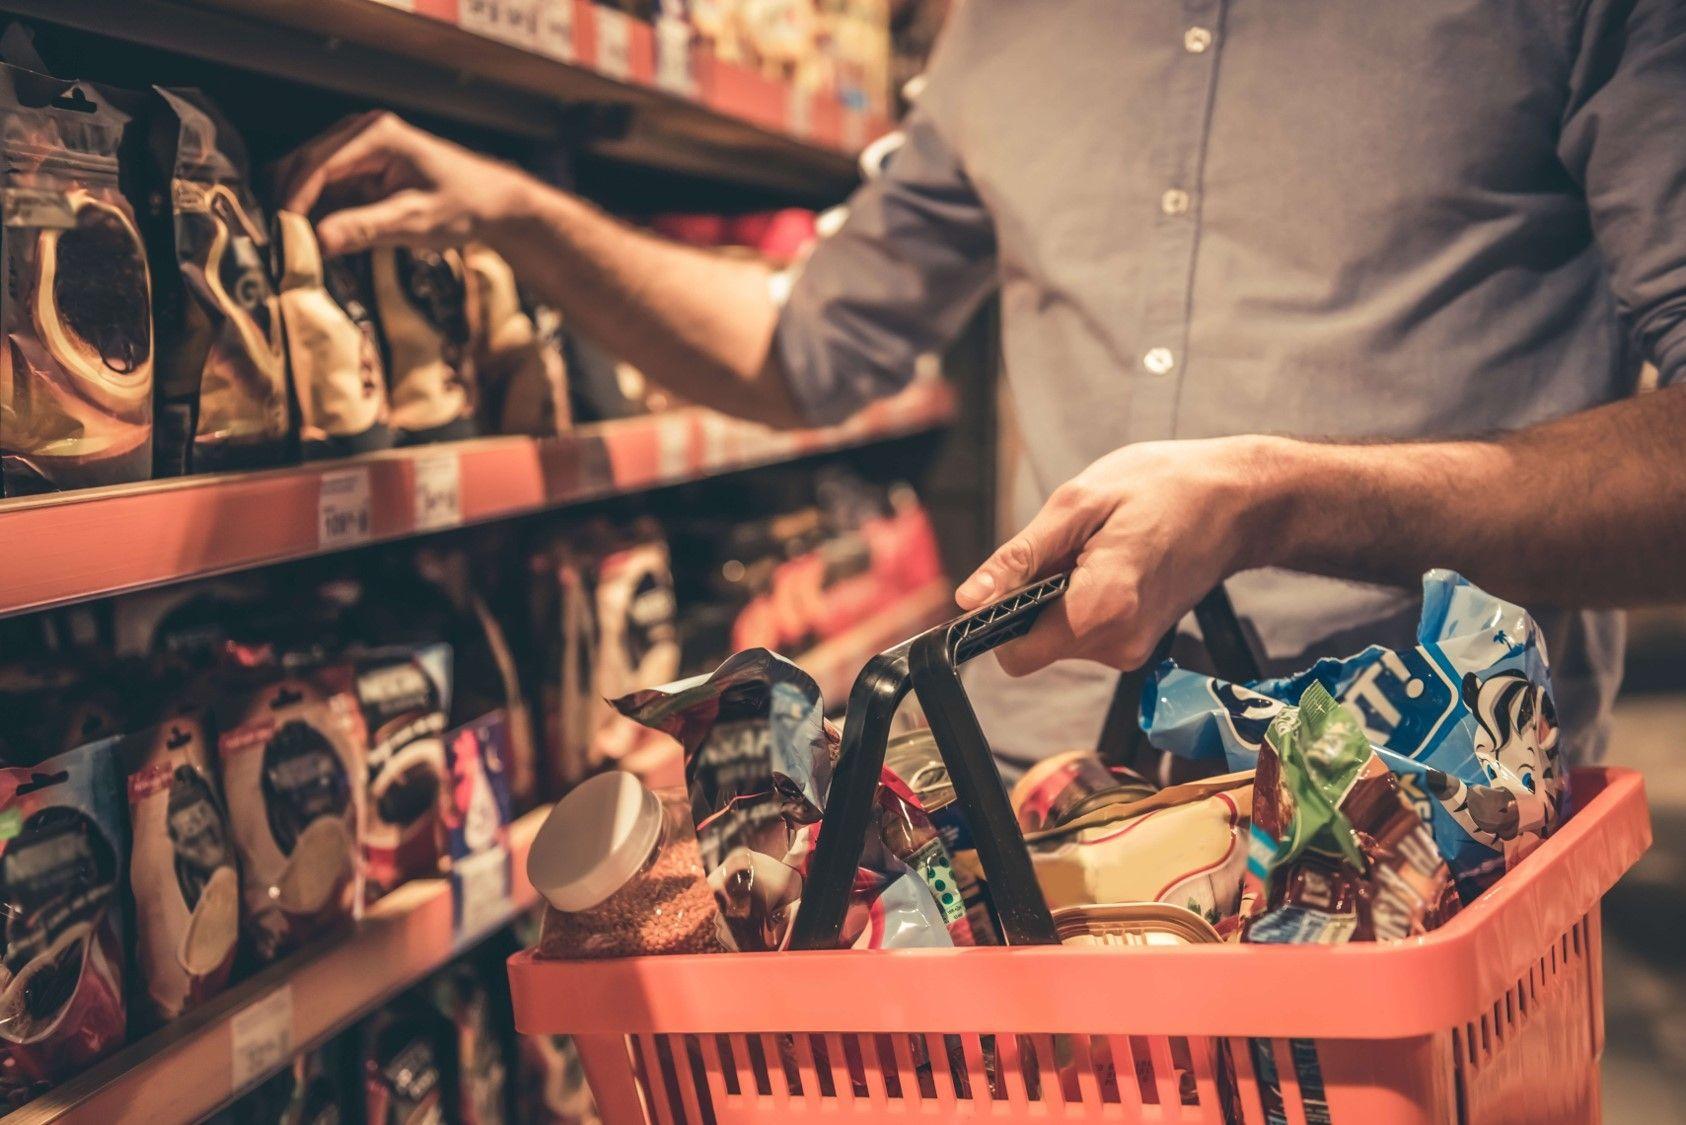 Retail aligning supplier values